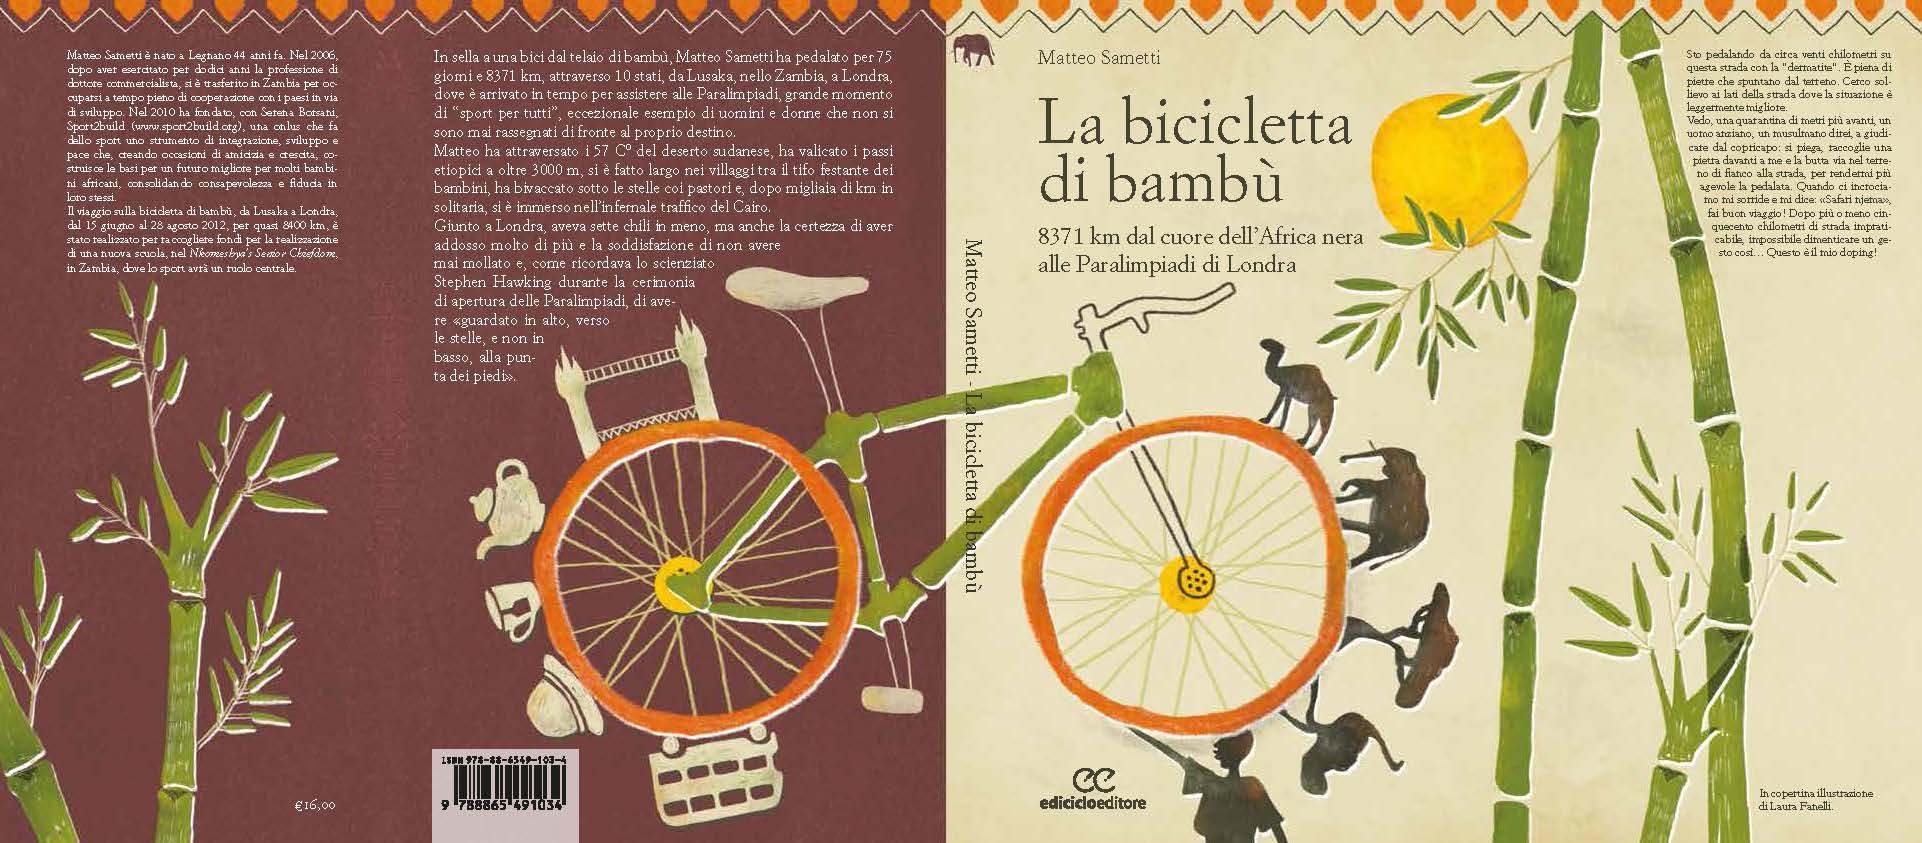 Copertina-La-bicicletta-di-bambù